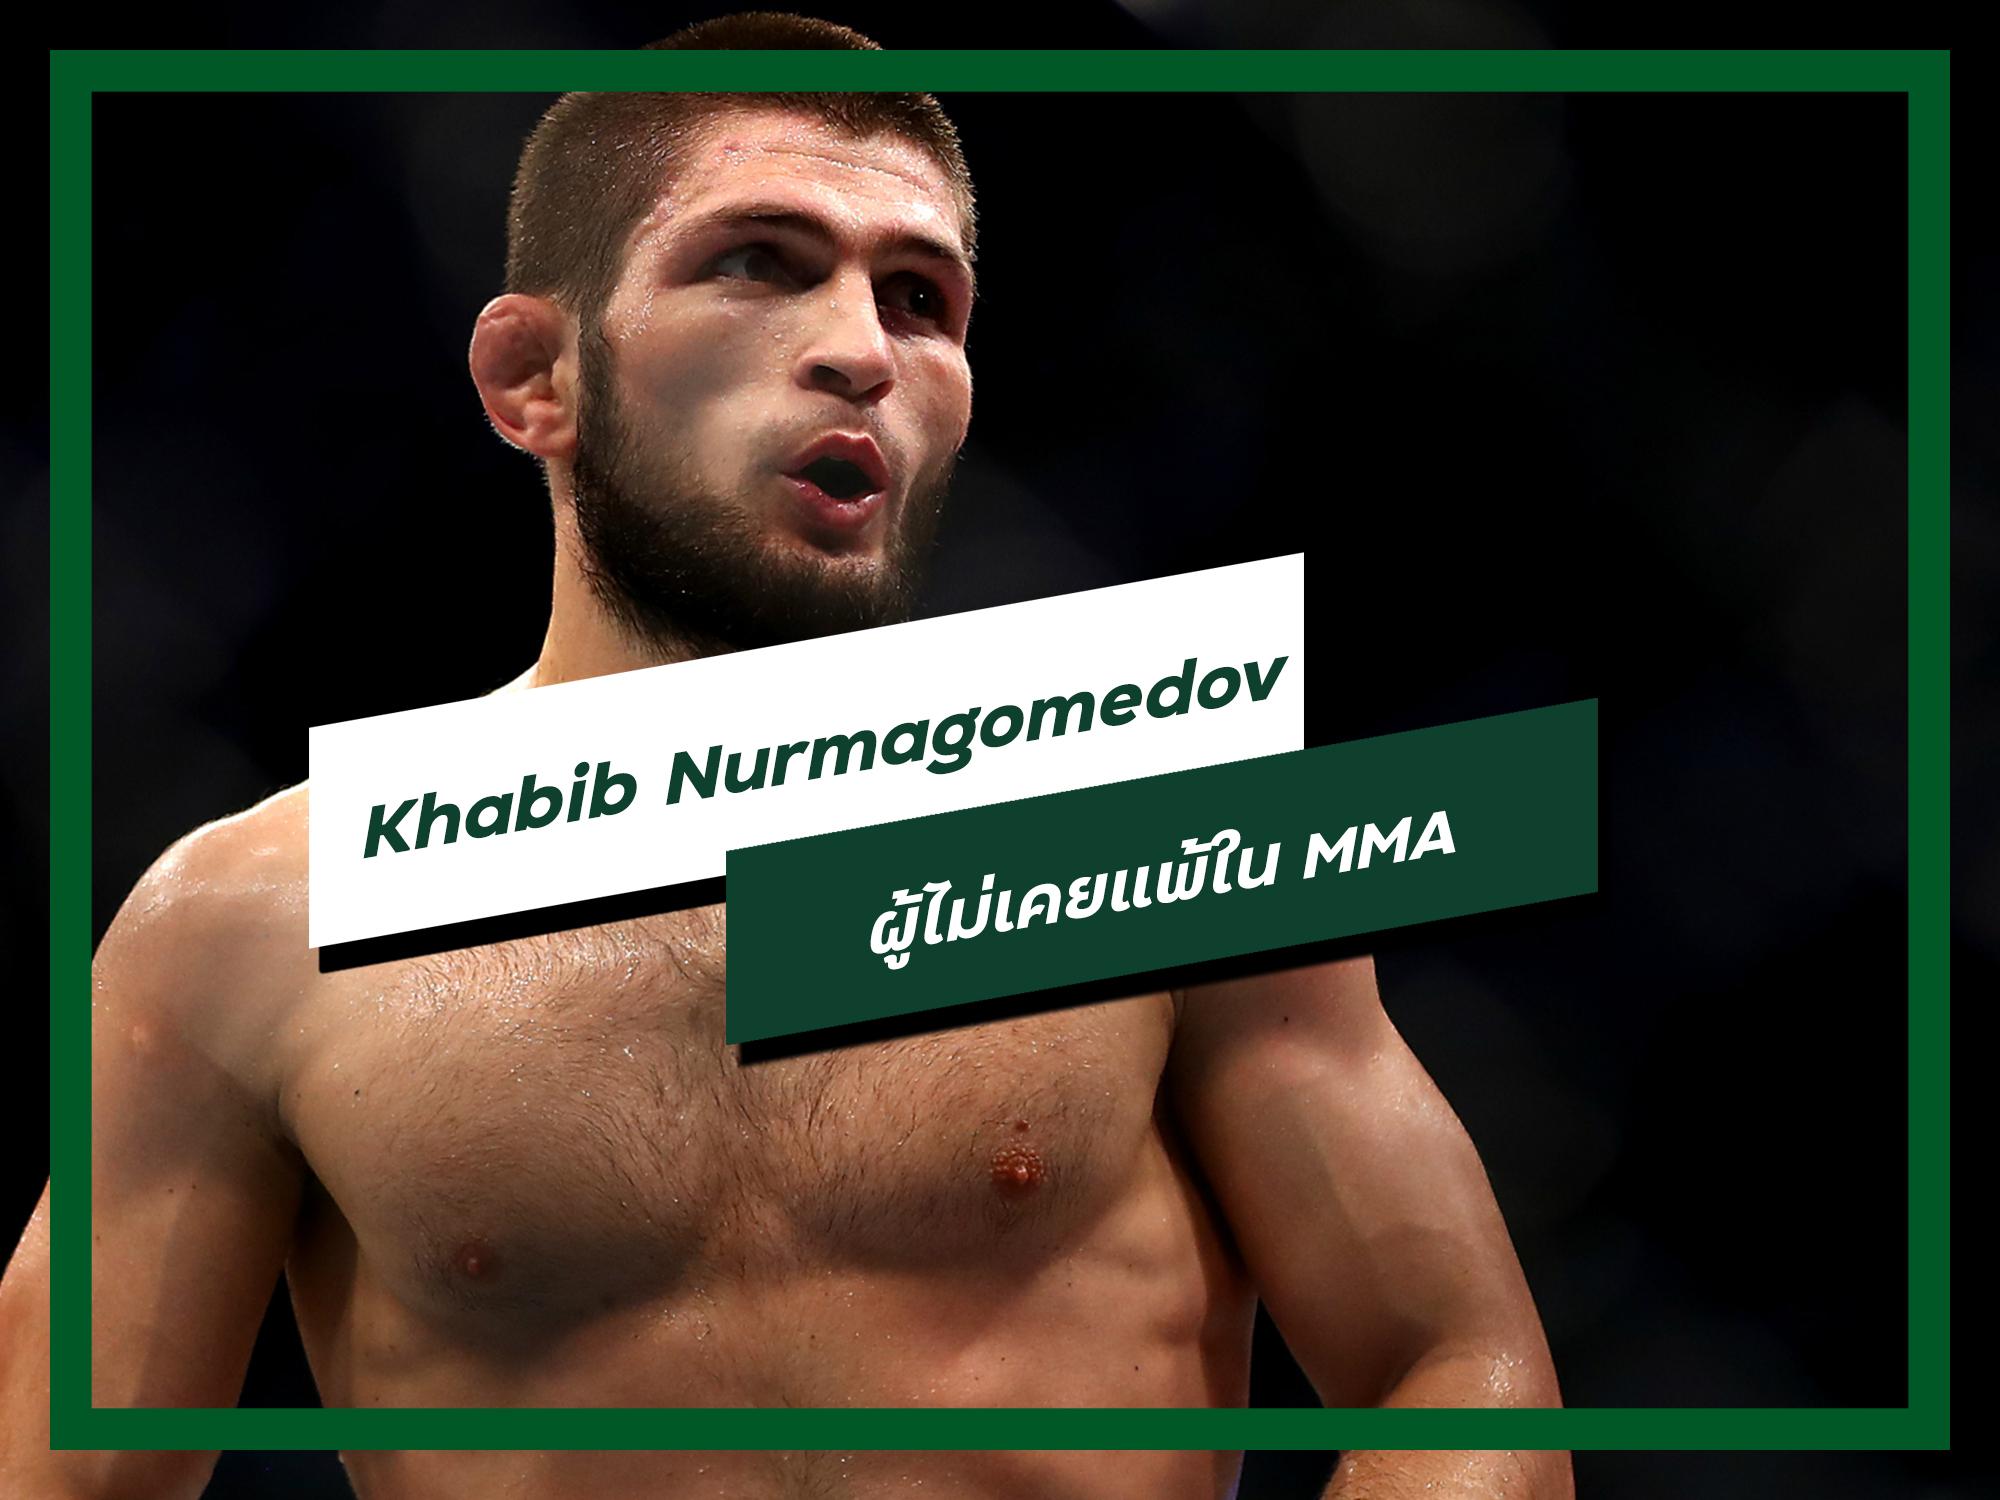 Khabib Nurmagomedov ผู้ไม่เคยแพ้ใน MMA